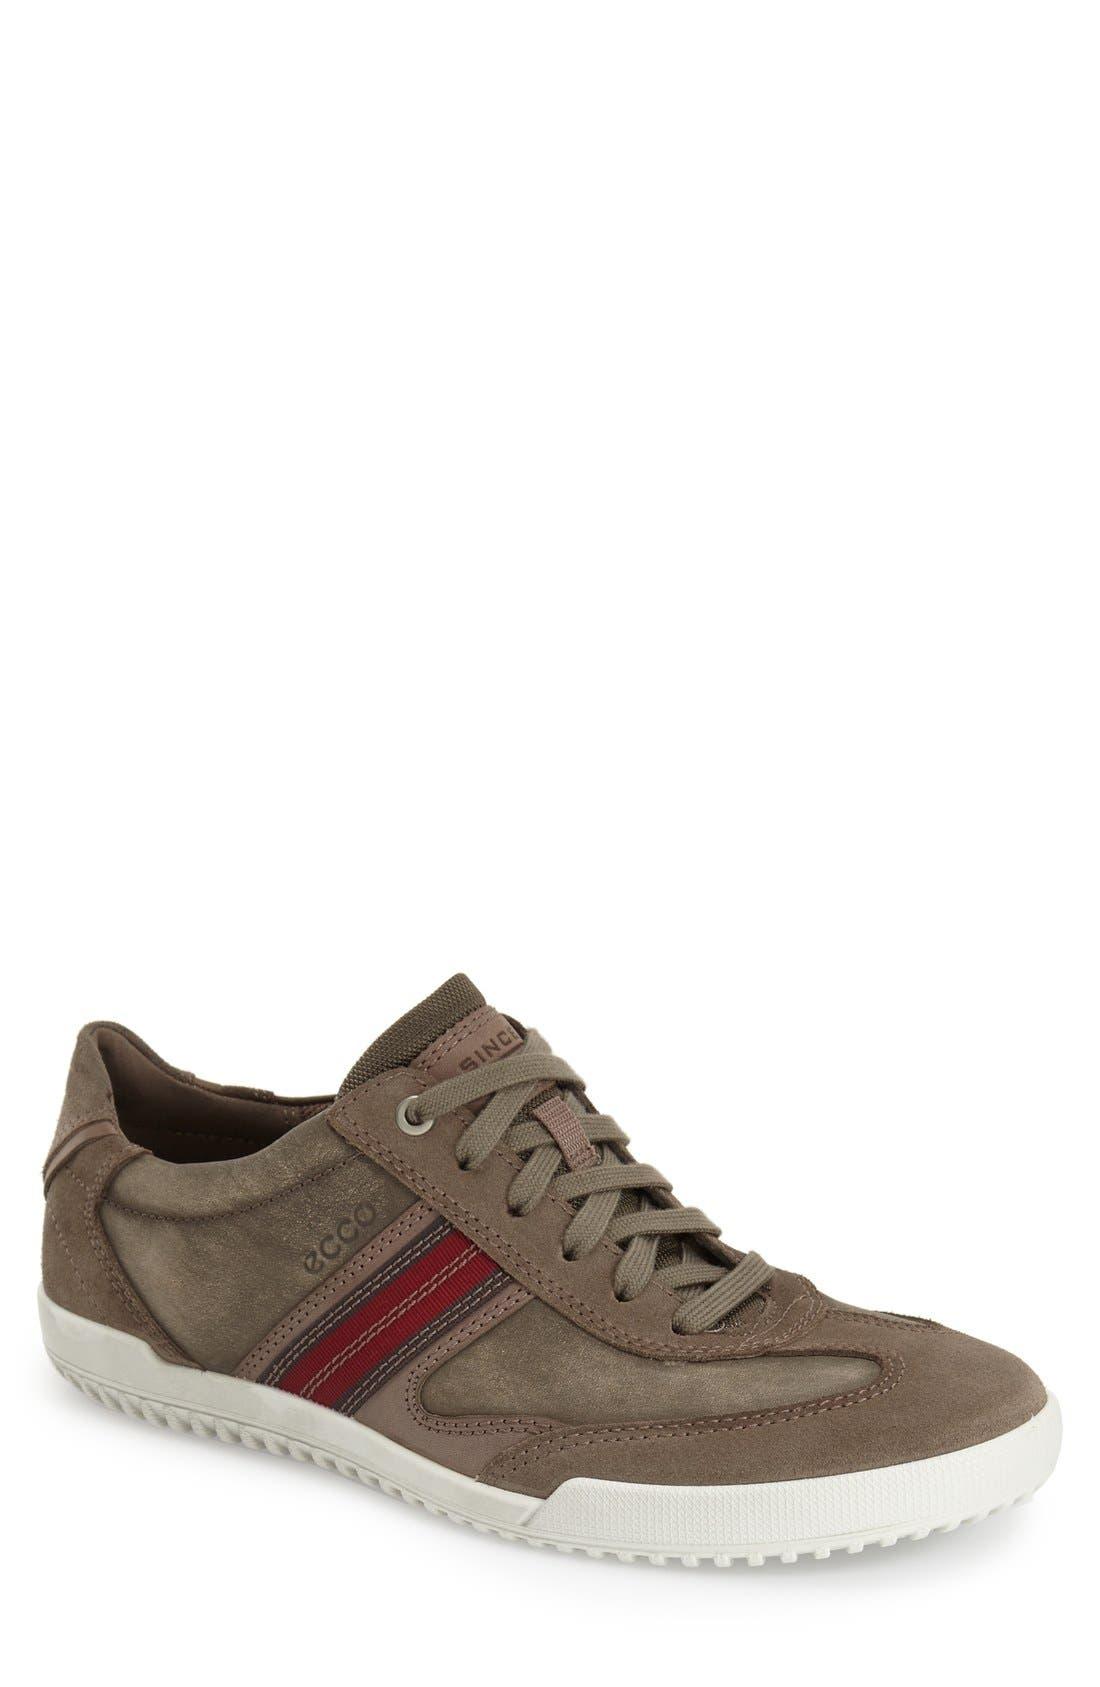 'Graham' Sneaker,                             Main thumbnail 1, color,                             035